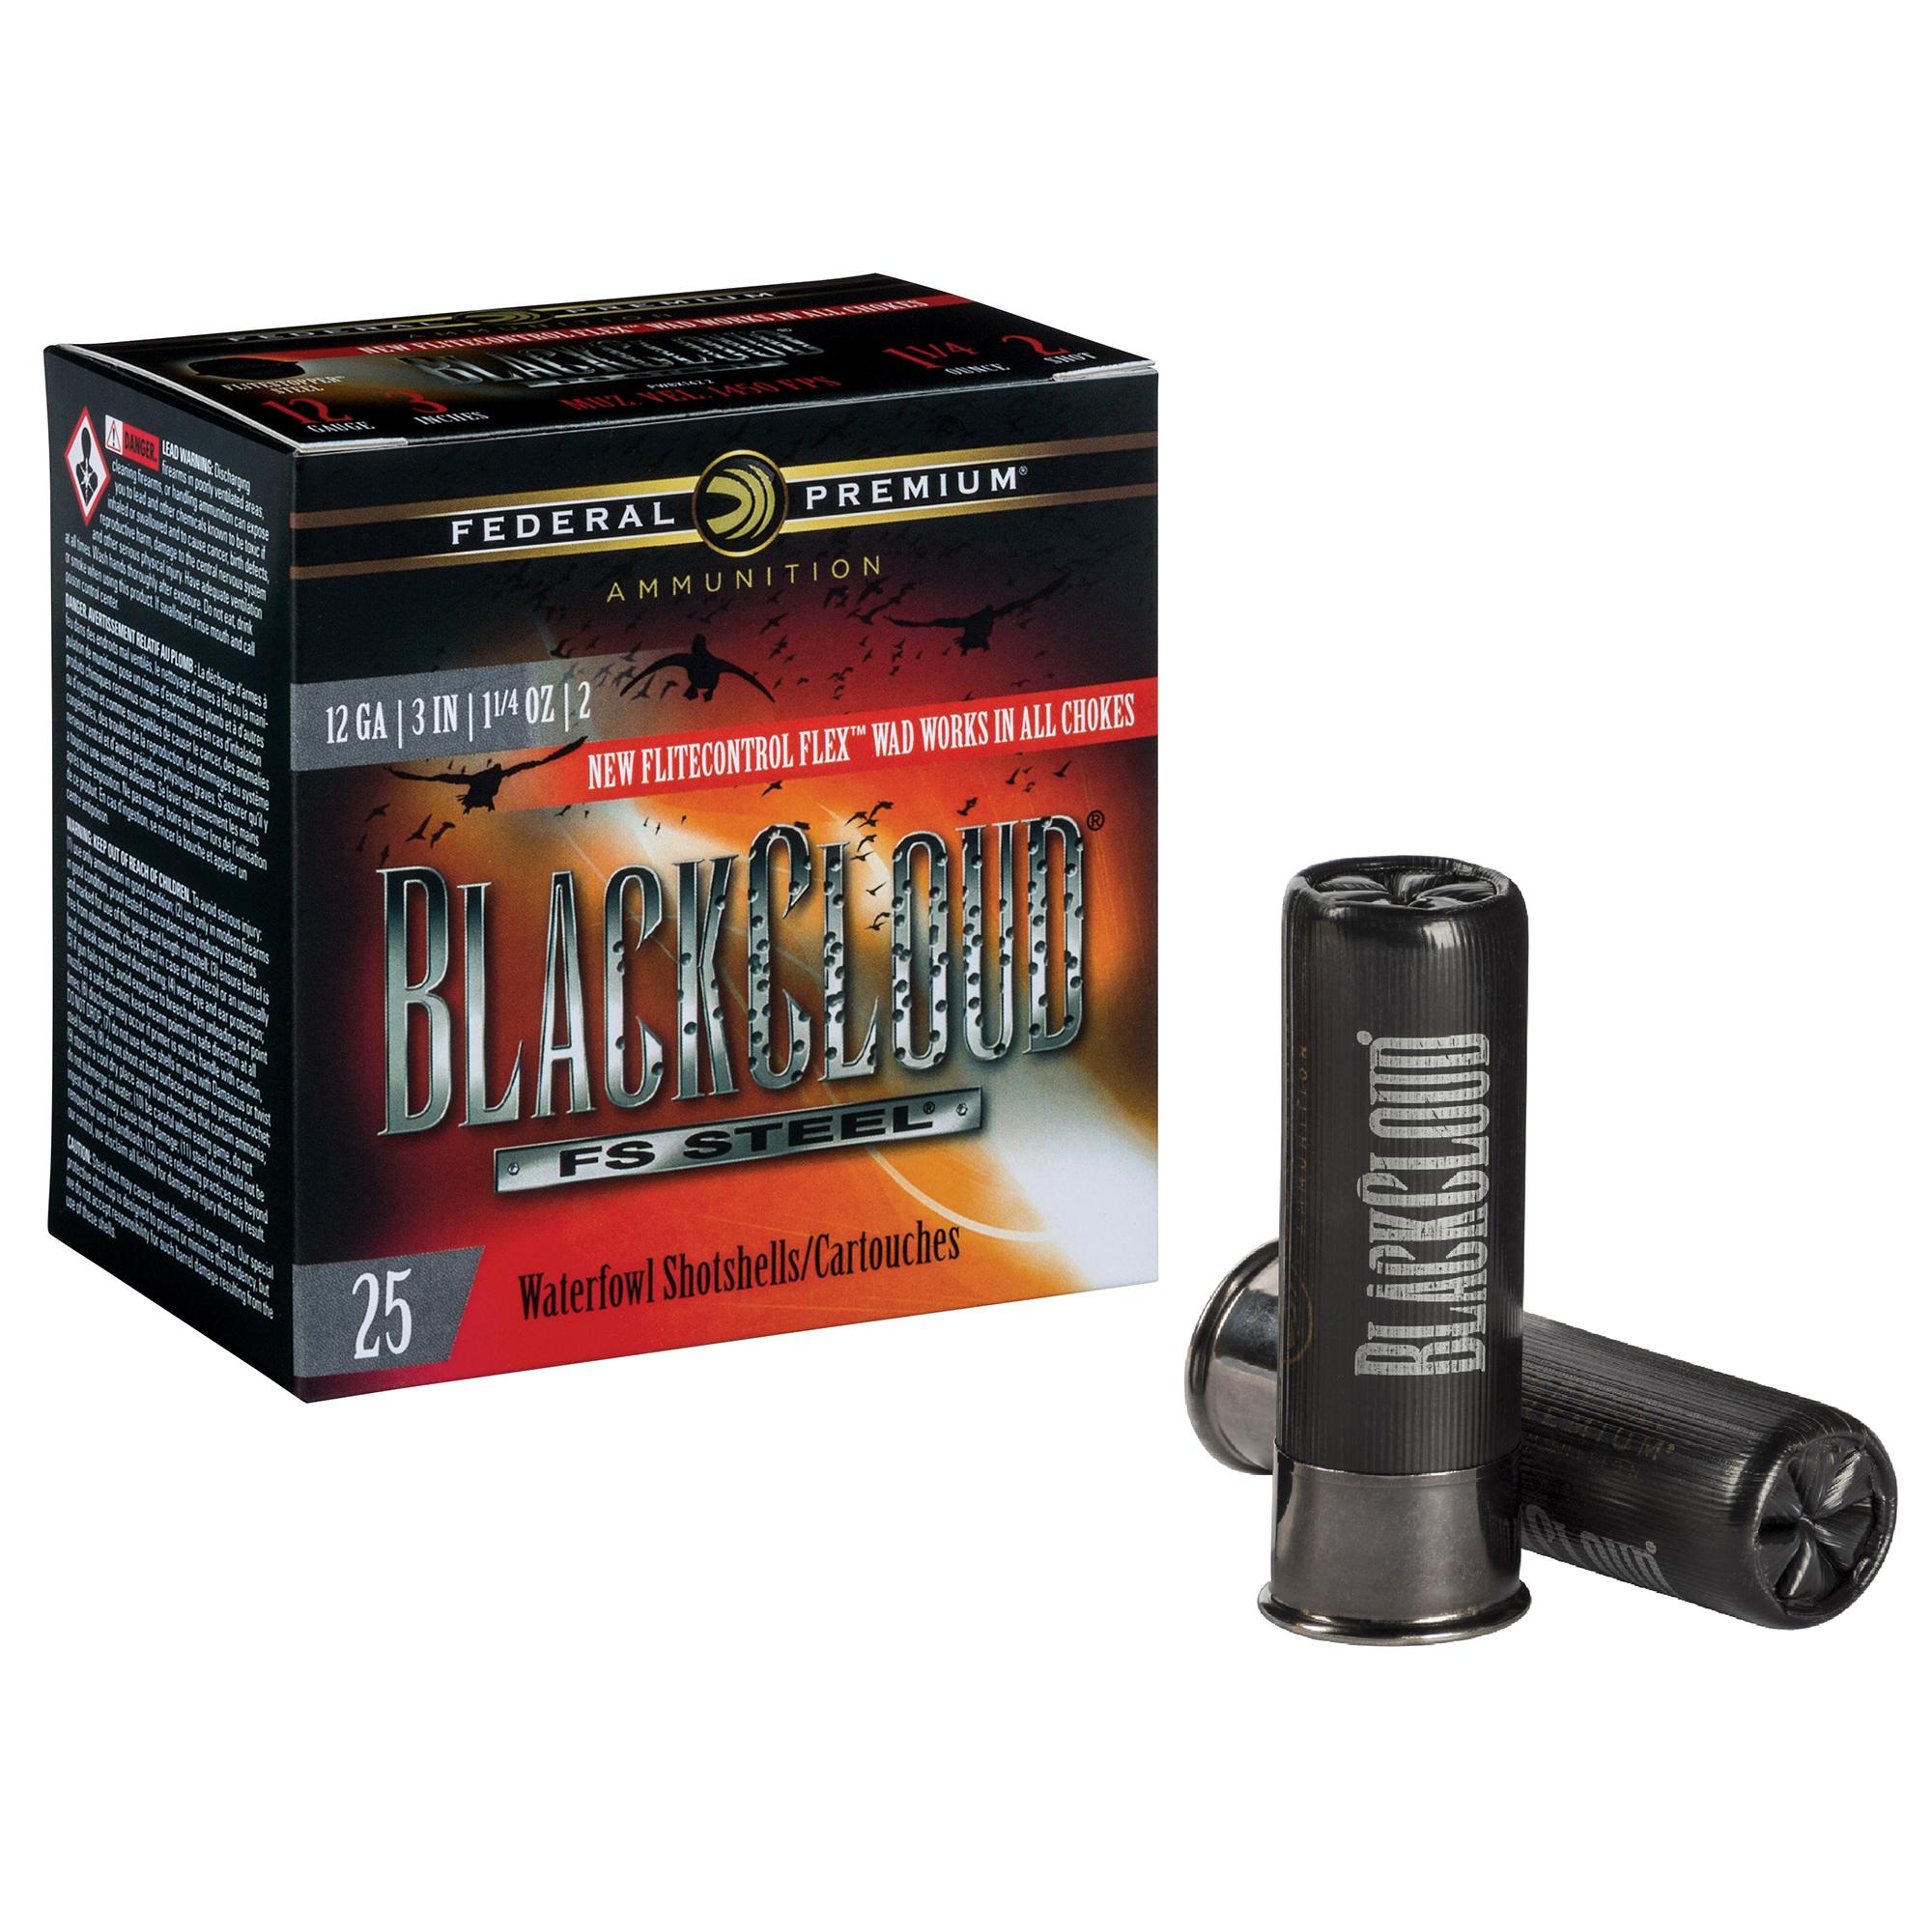 Federal Premium Black Cloud FS Steel Loads, 12-ga, 3-1/2″, 1-1/2 oz, BBB